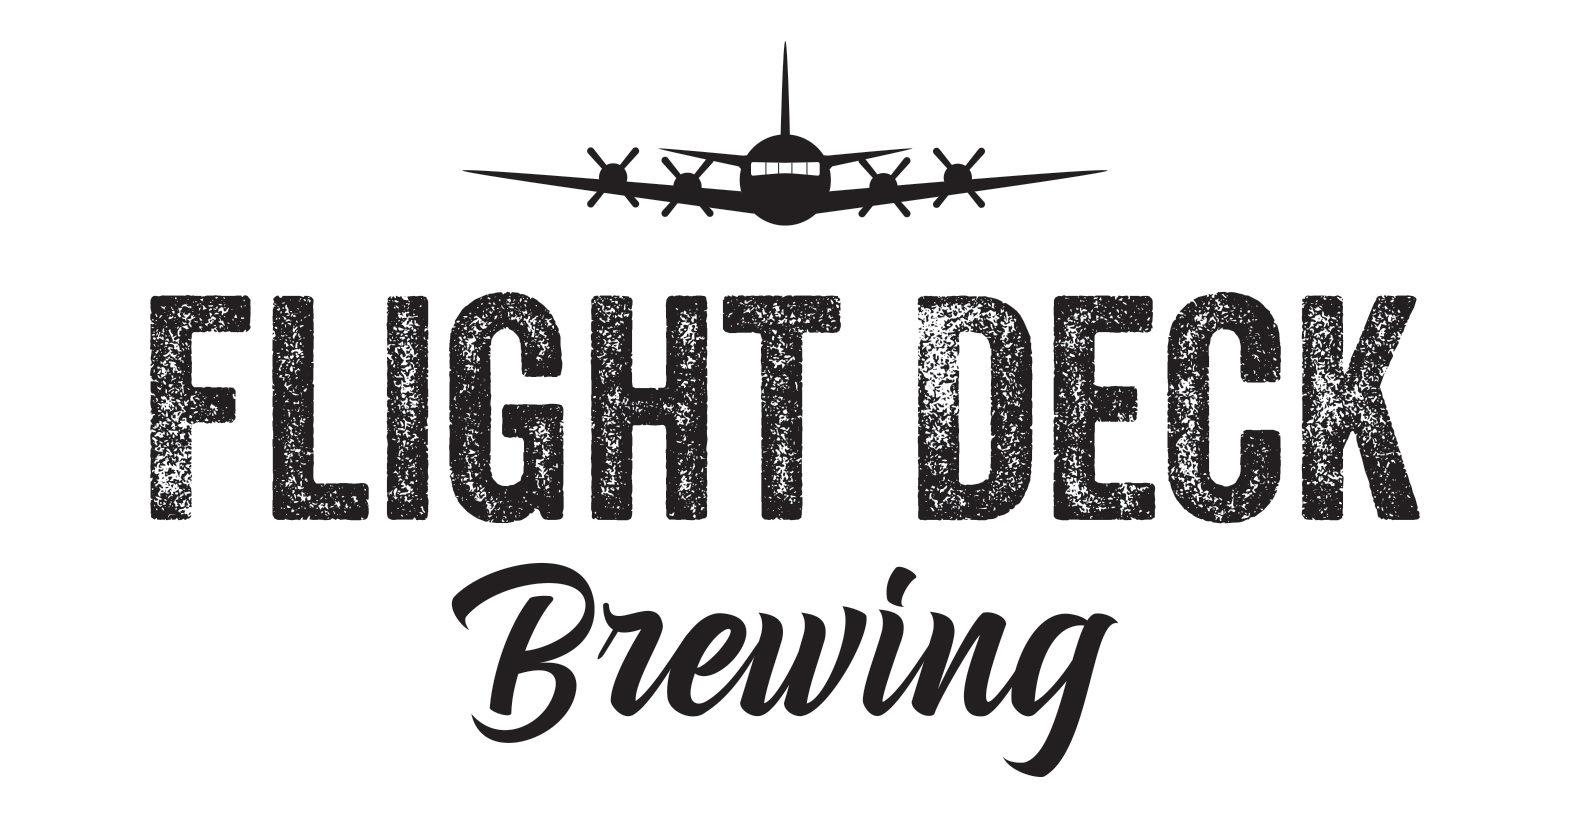 flight-deck-brewing